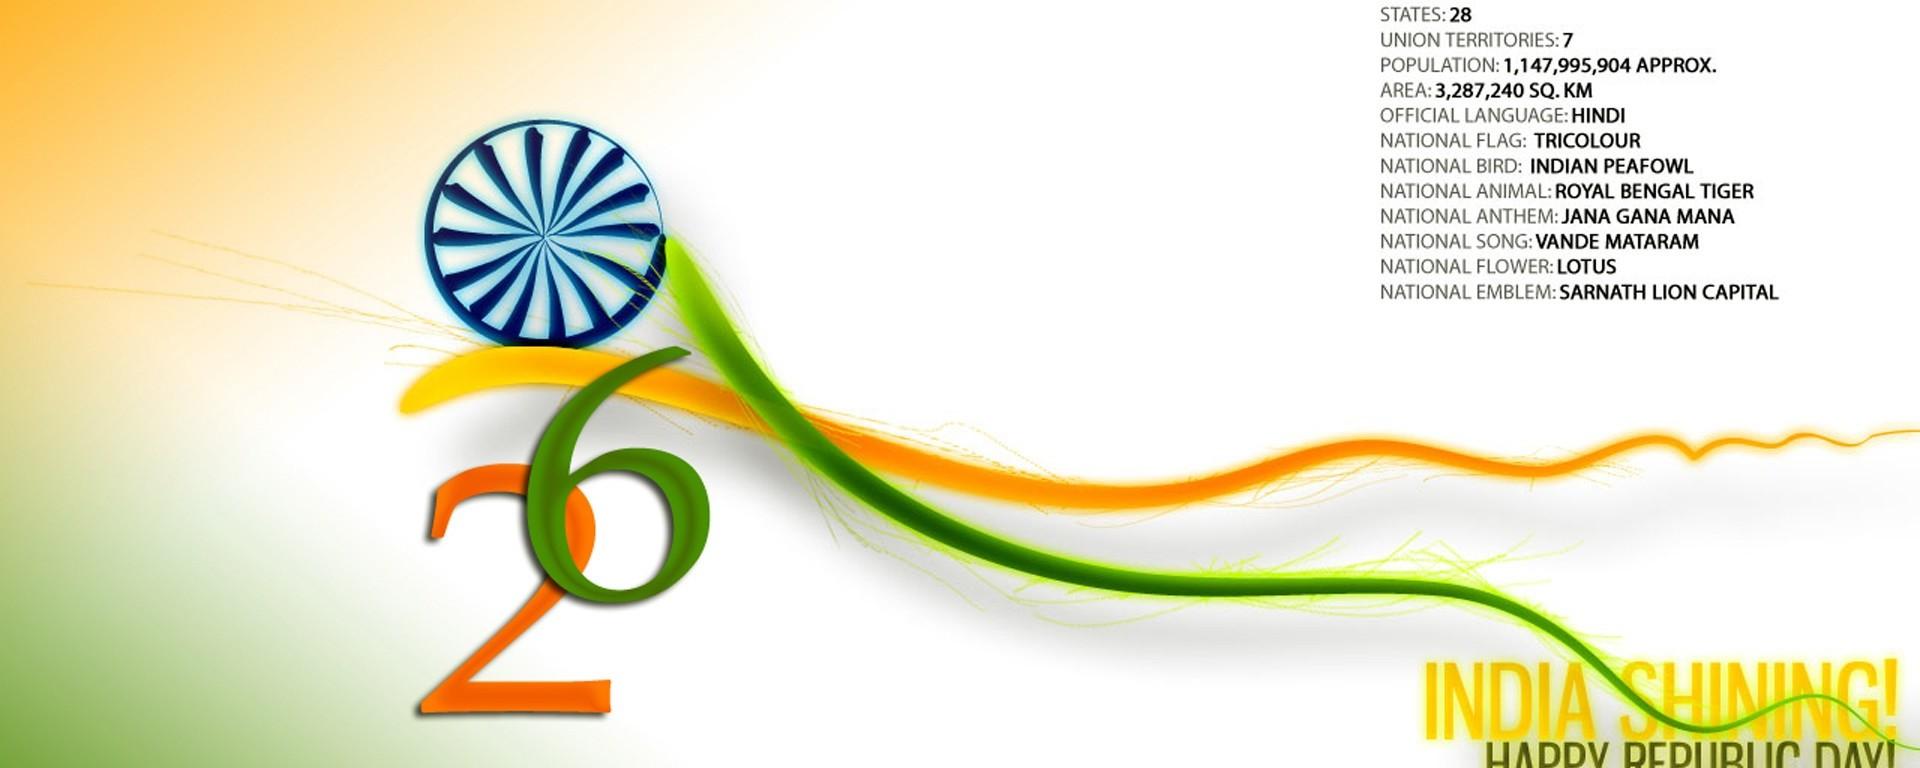 Bharat darshan 67th republic day greetings bhavanajagat bharat darshan 67th republic day greetings m4hsunfo